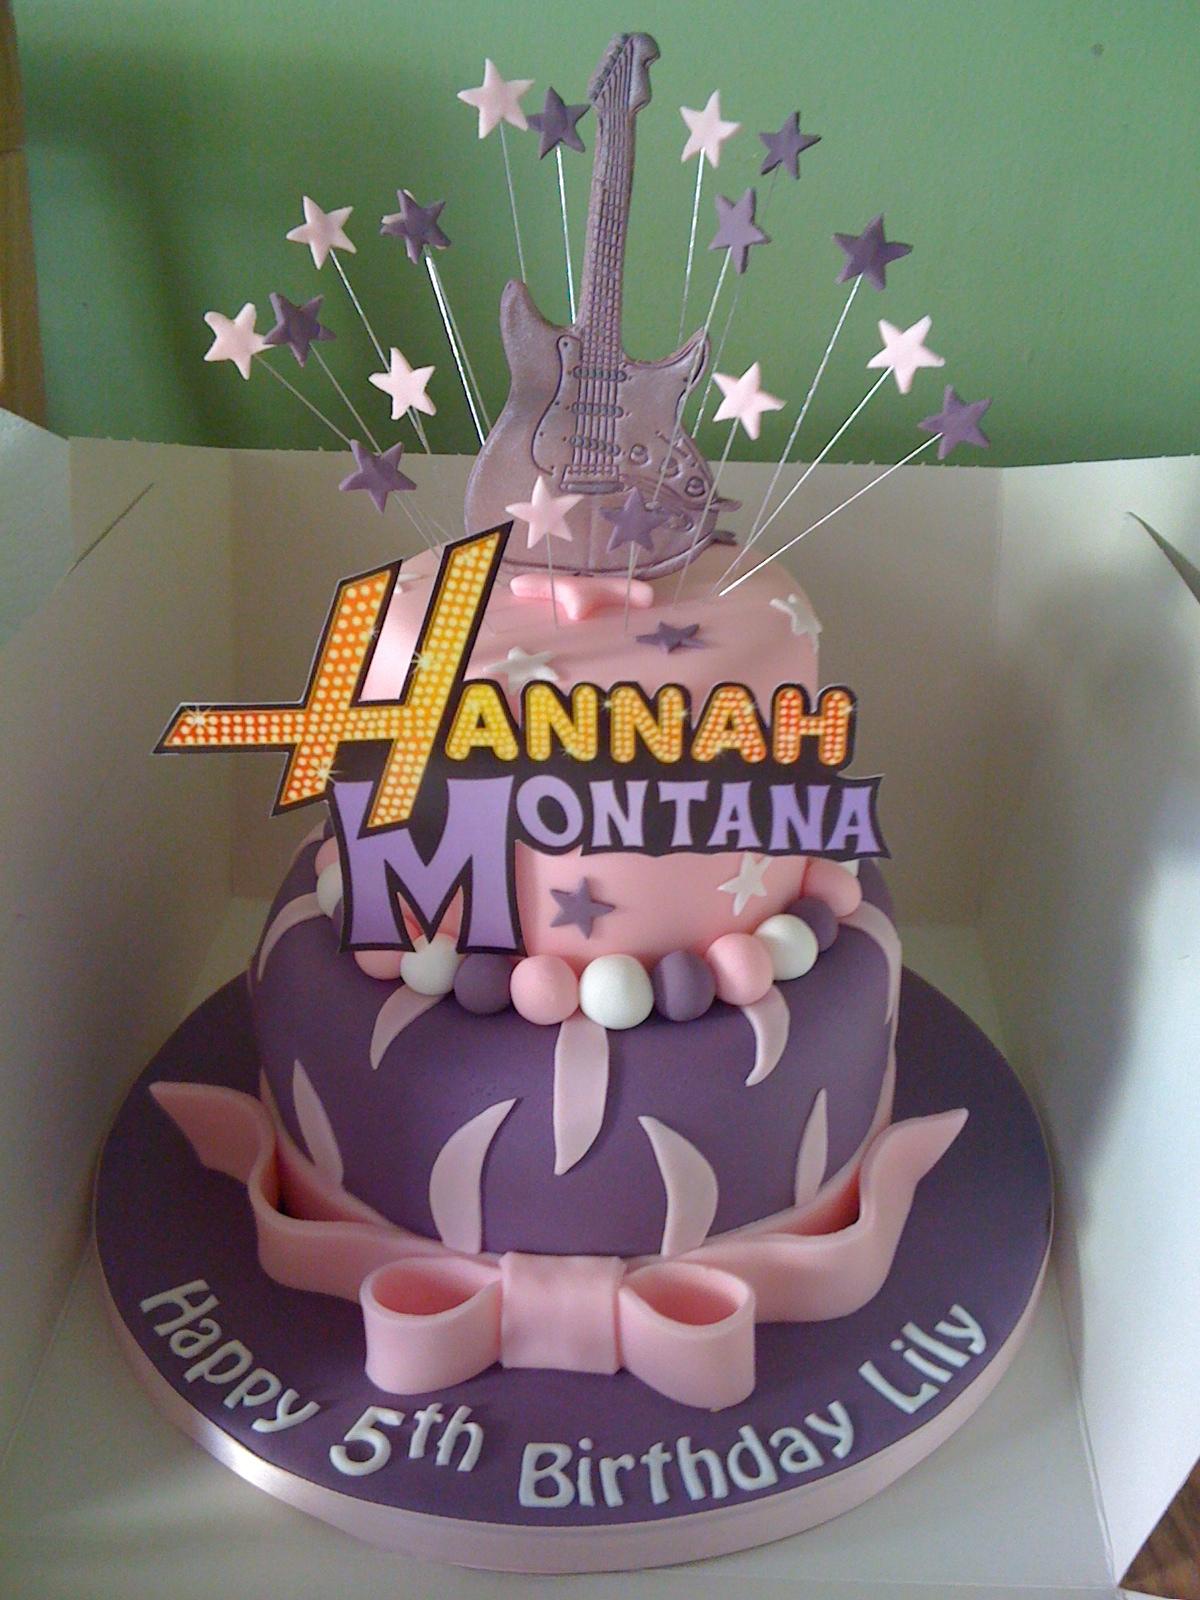 Cakes By Karen Hannah Montana Cake